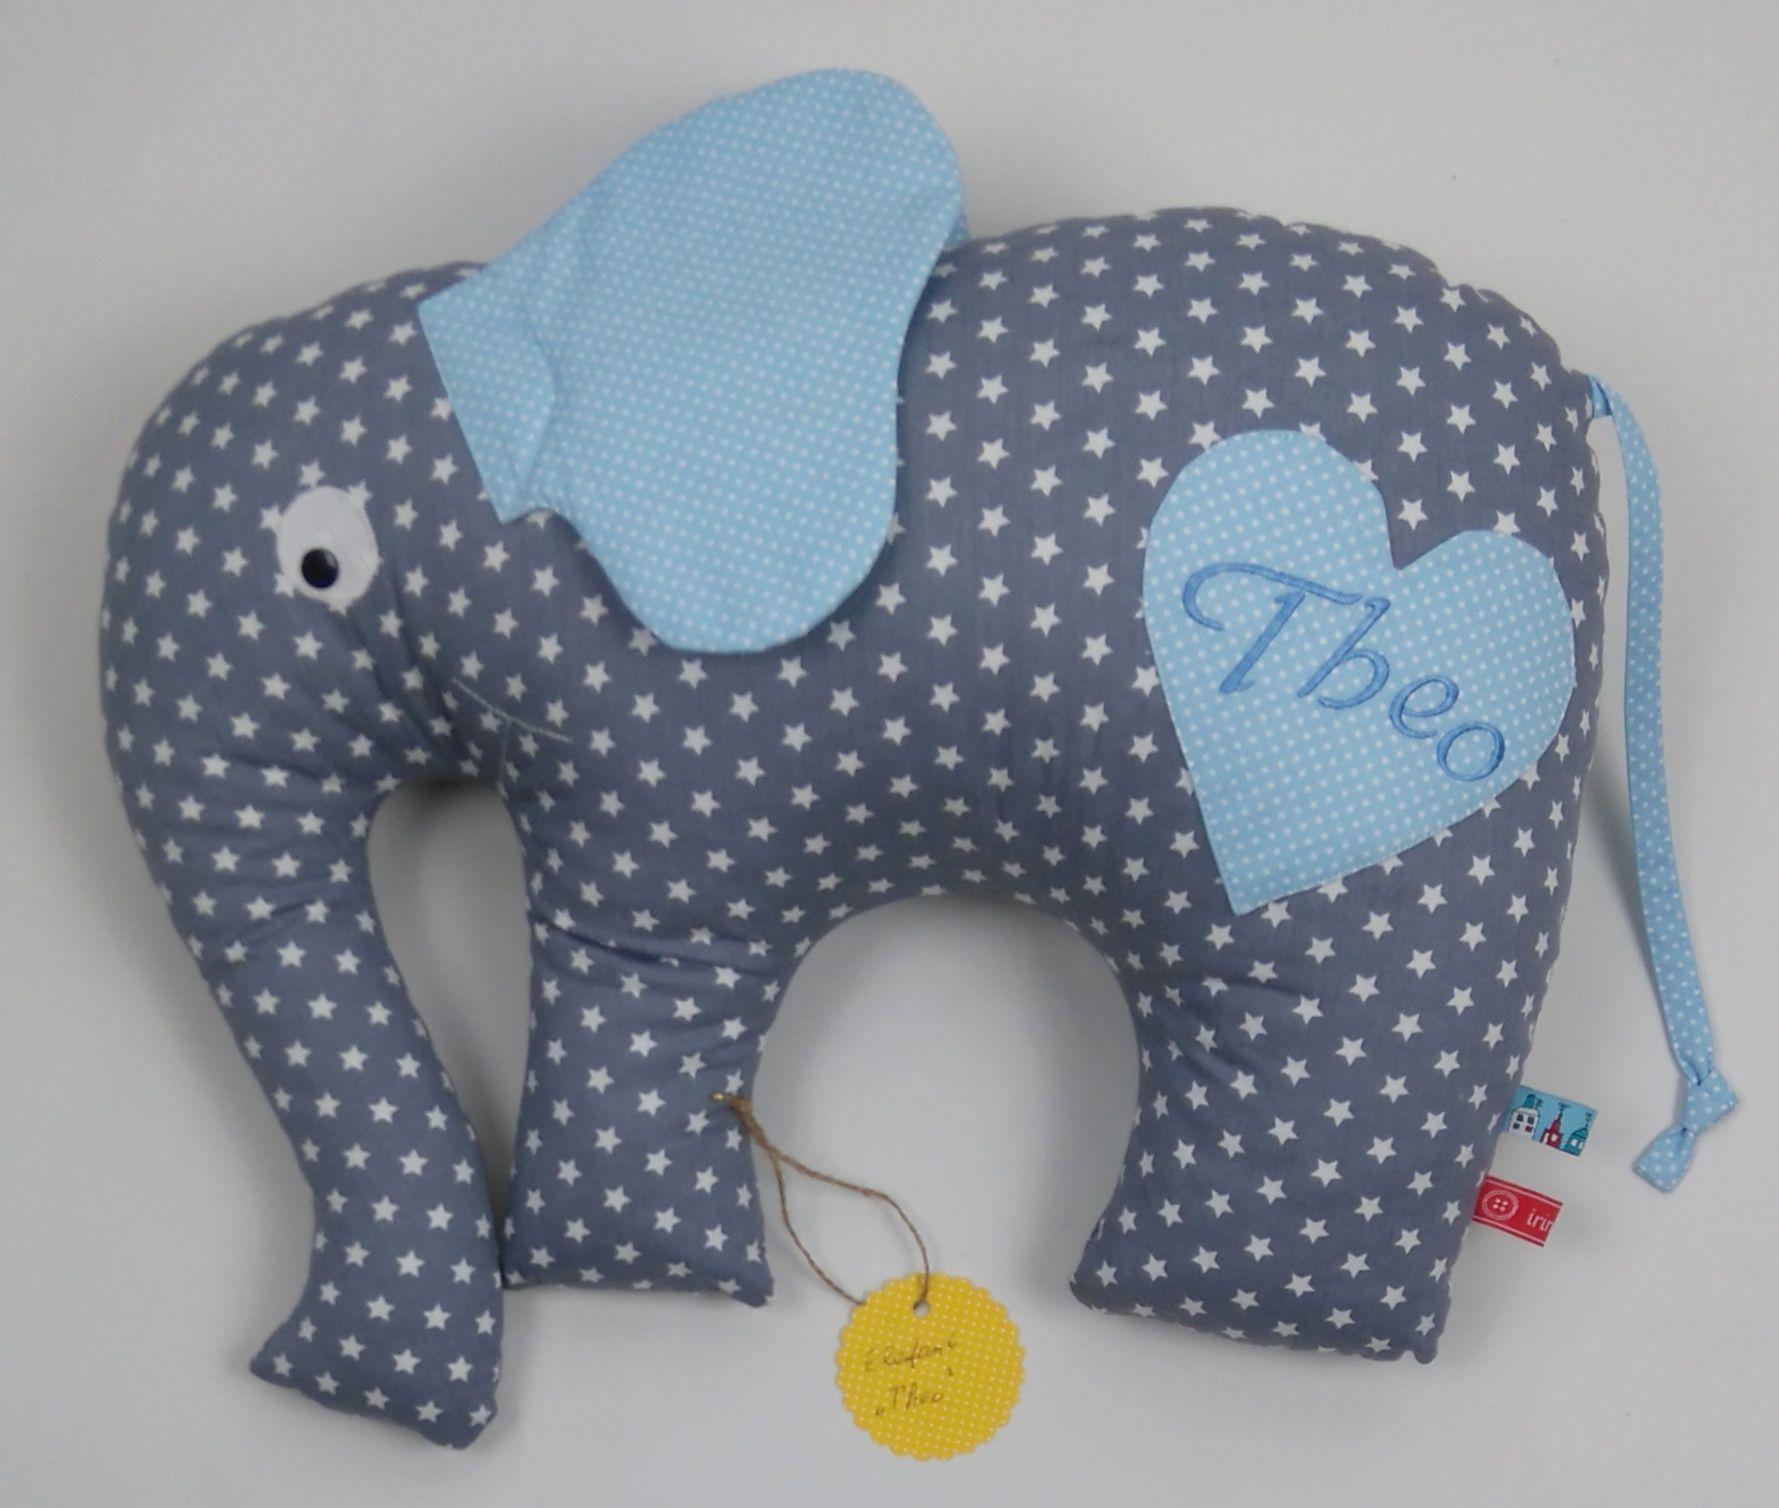 Elefantkissen Handgefertigt Mit Wunschname Elefant Gr 52x40